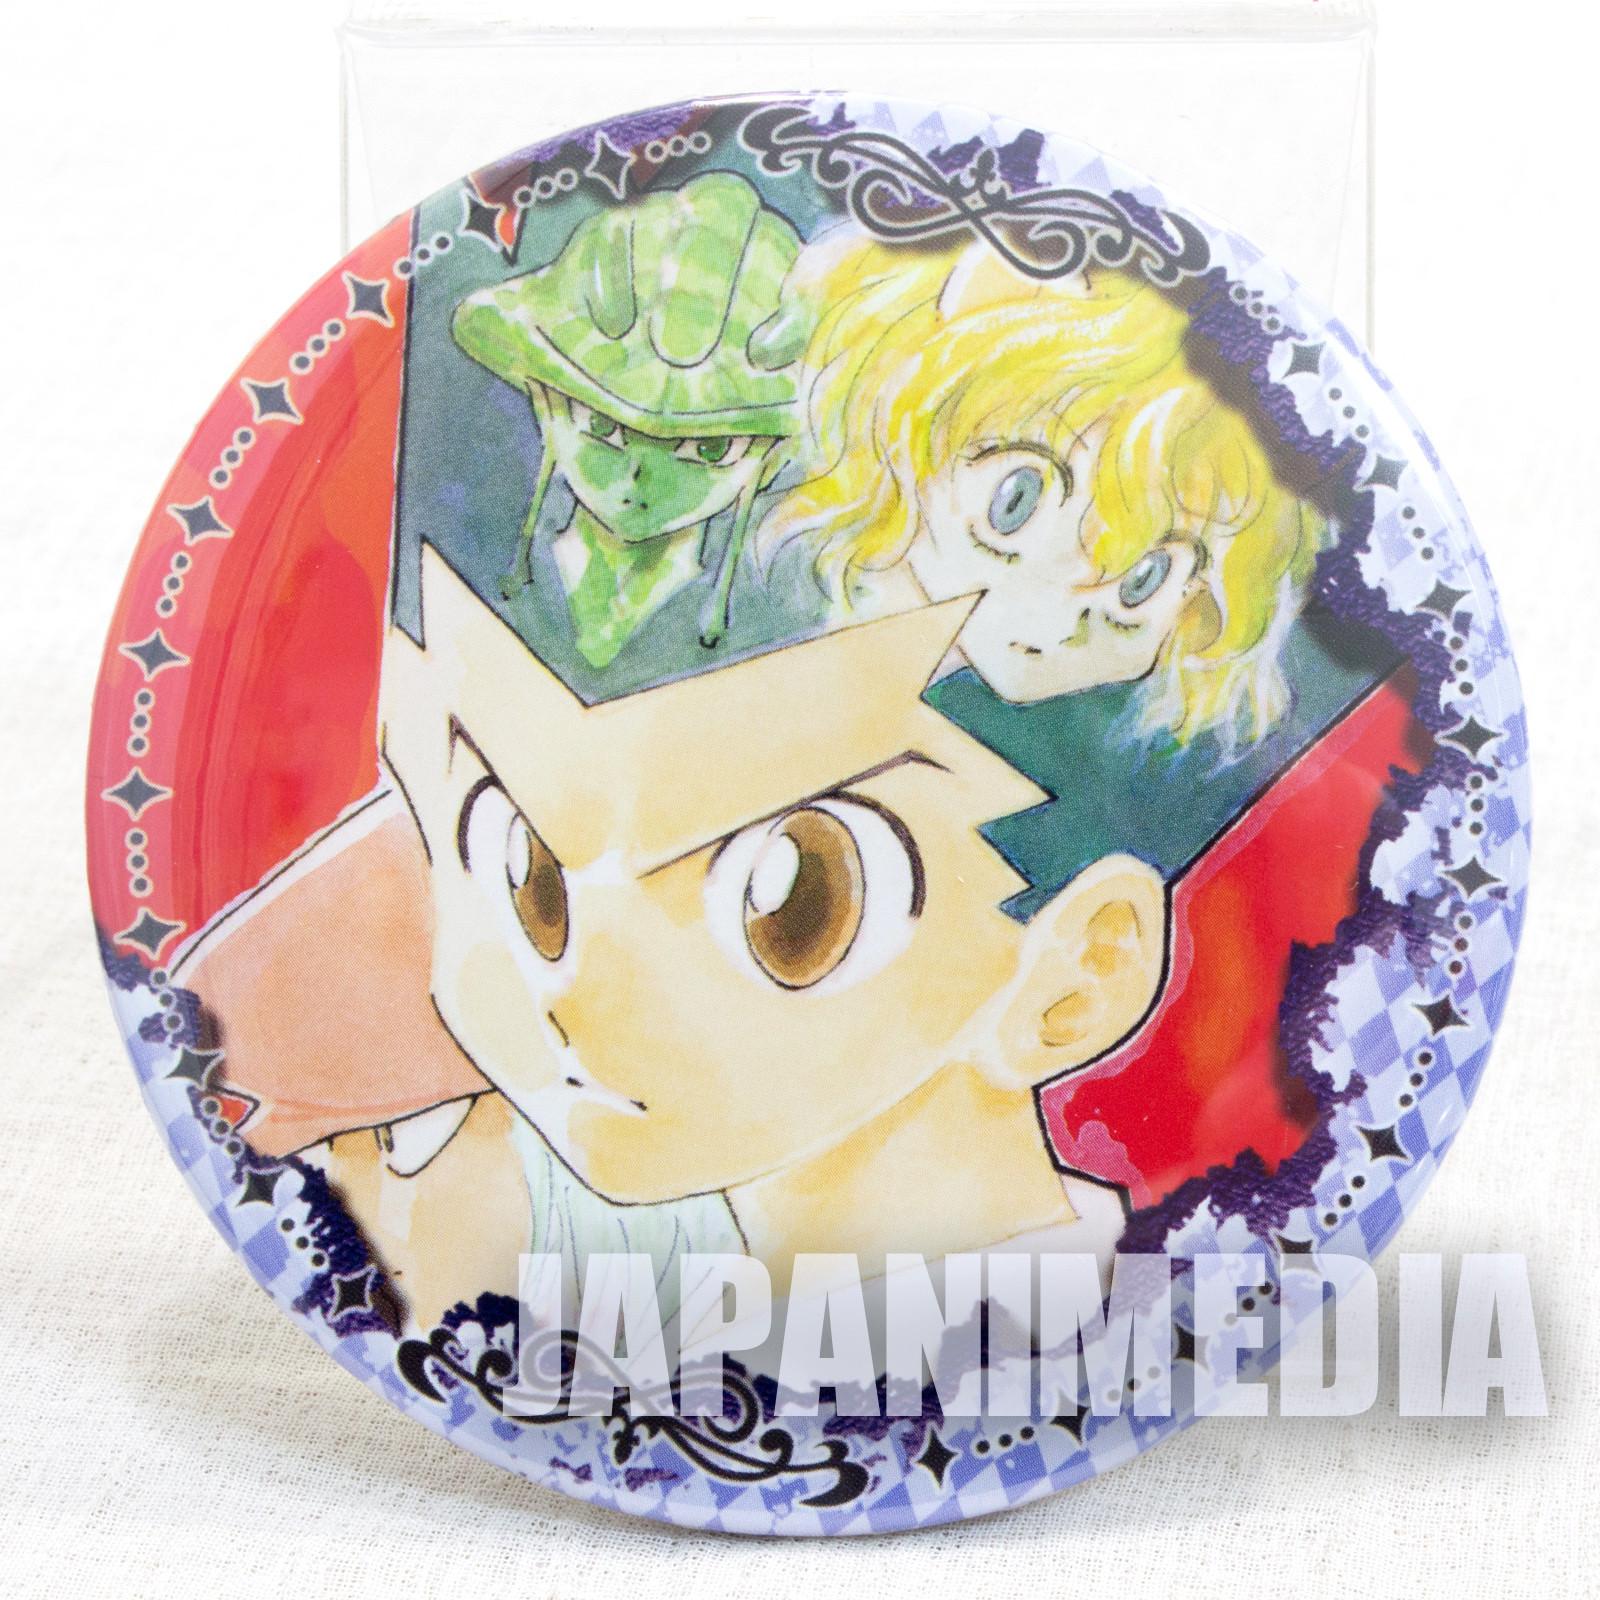 HUNTER x HUNTER Gon Freecss & Meruem & Neferpitou Collection Button Badge JAPAN ANIME